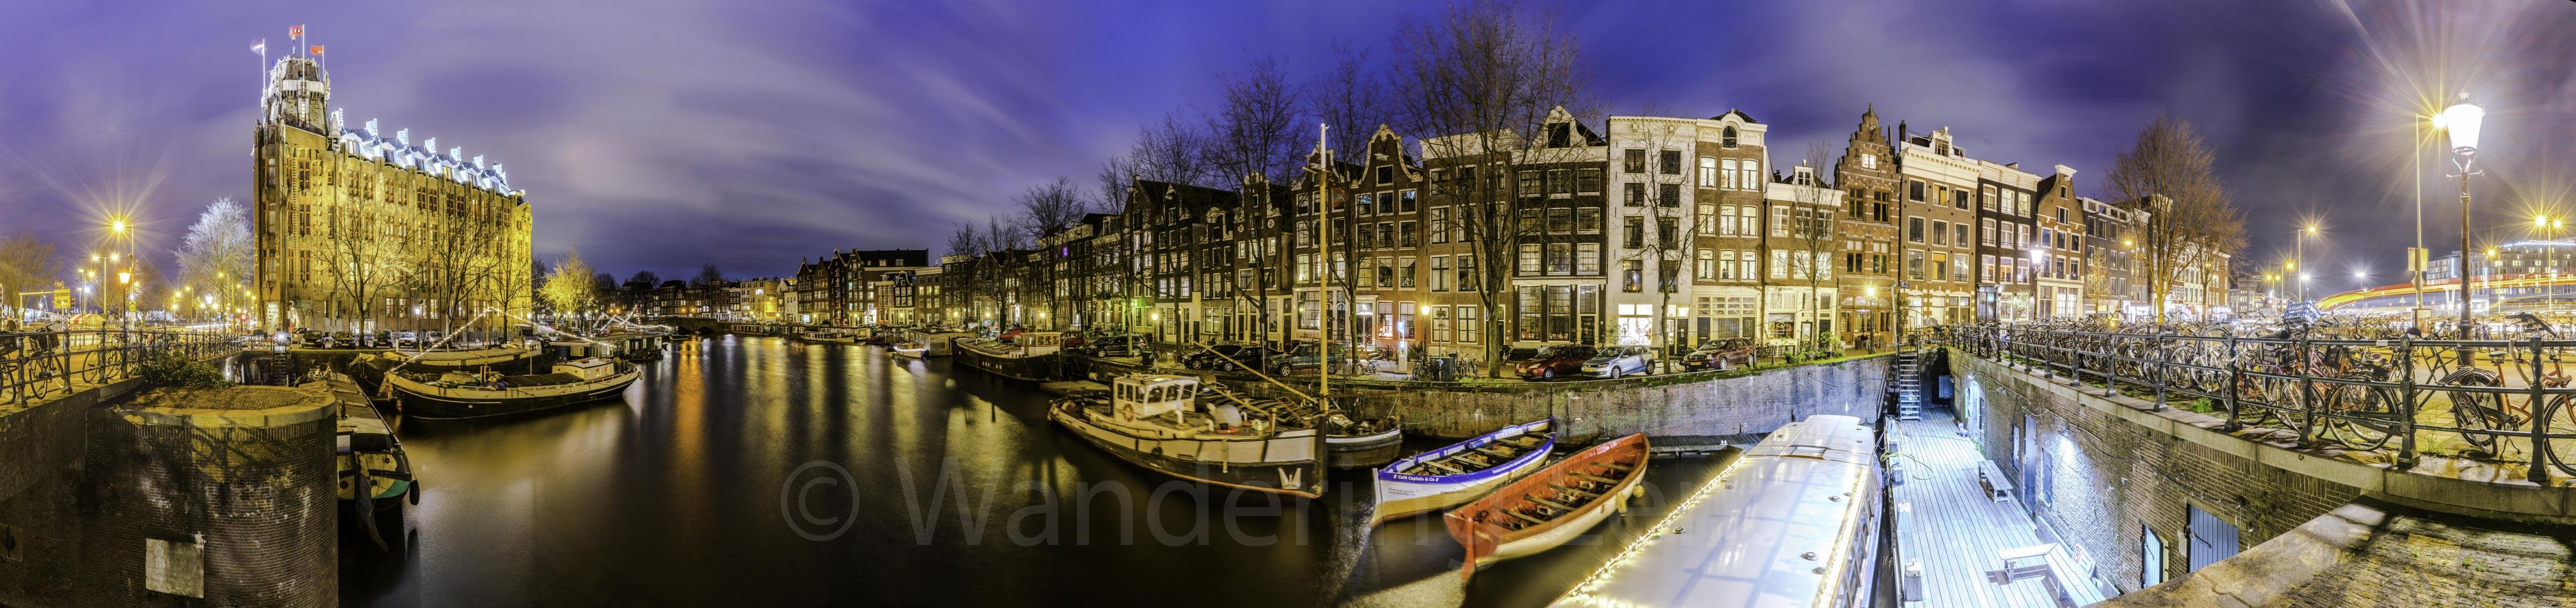 A Quiet Amsterdam